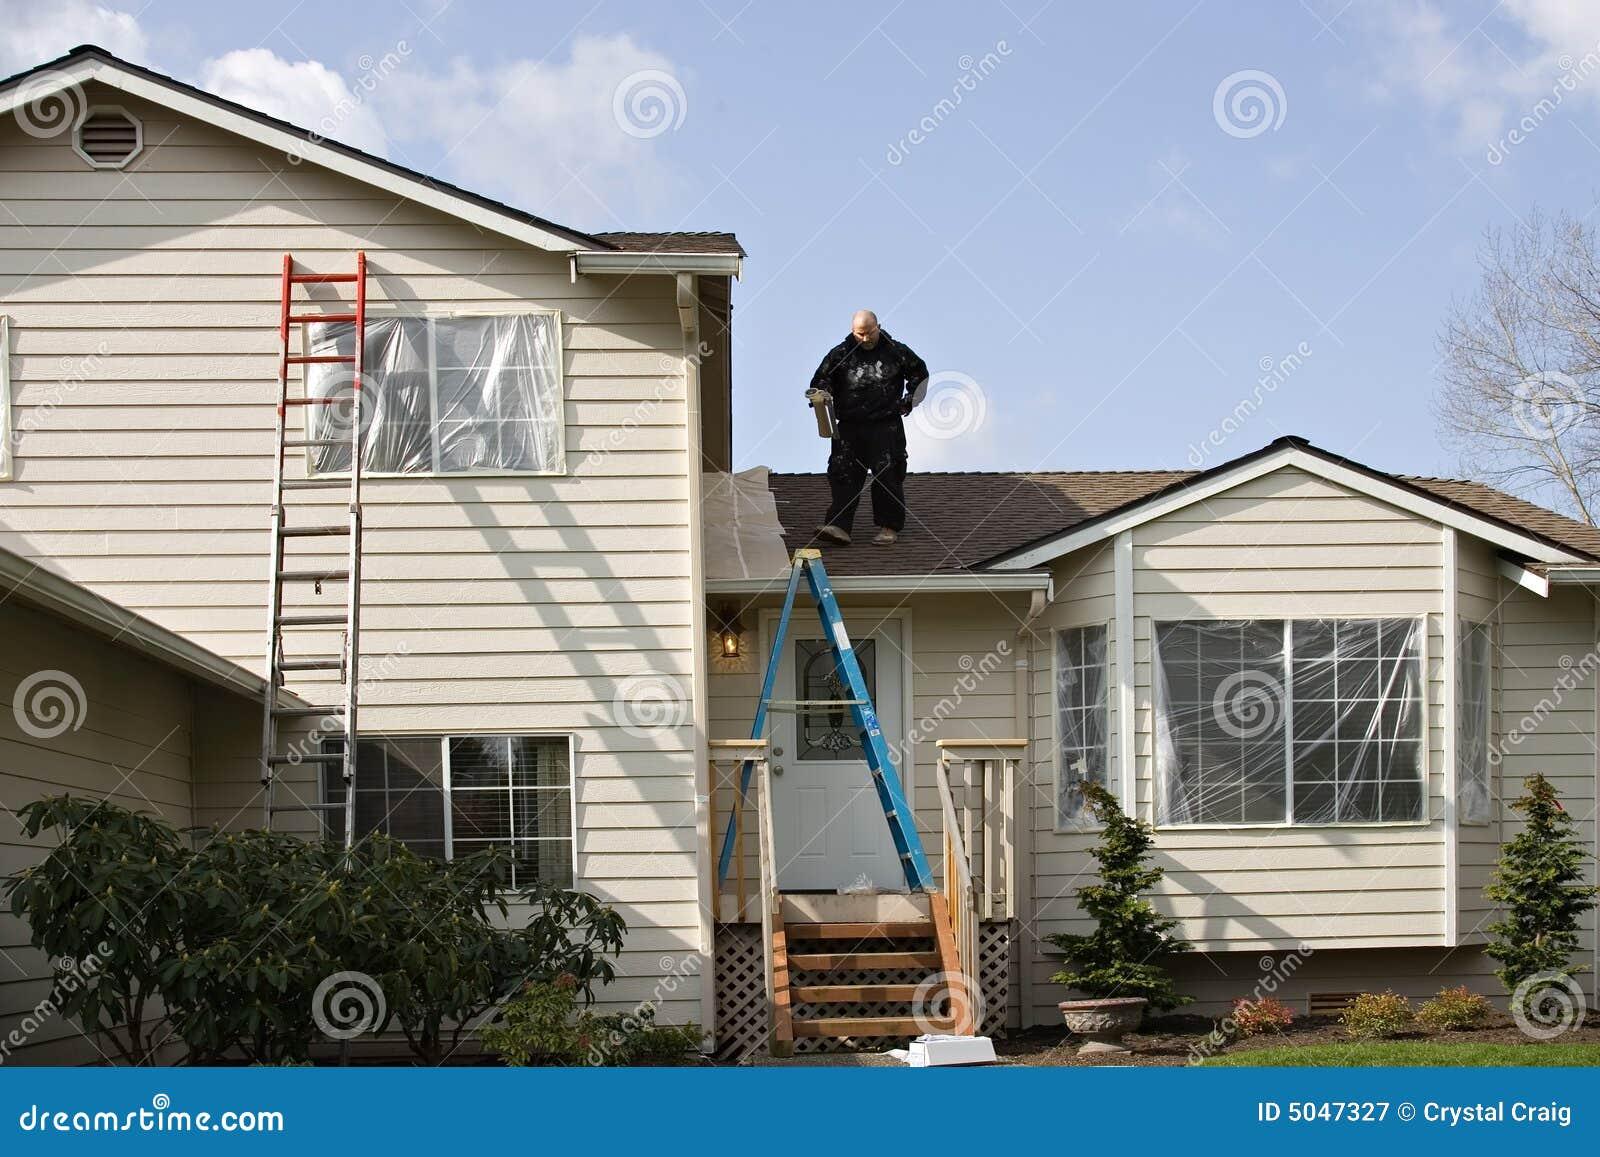 Pintura de casa exterior imagen de archivo. Imagen de mantenga - 5047327